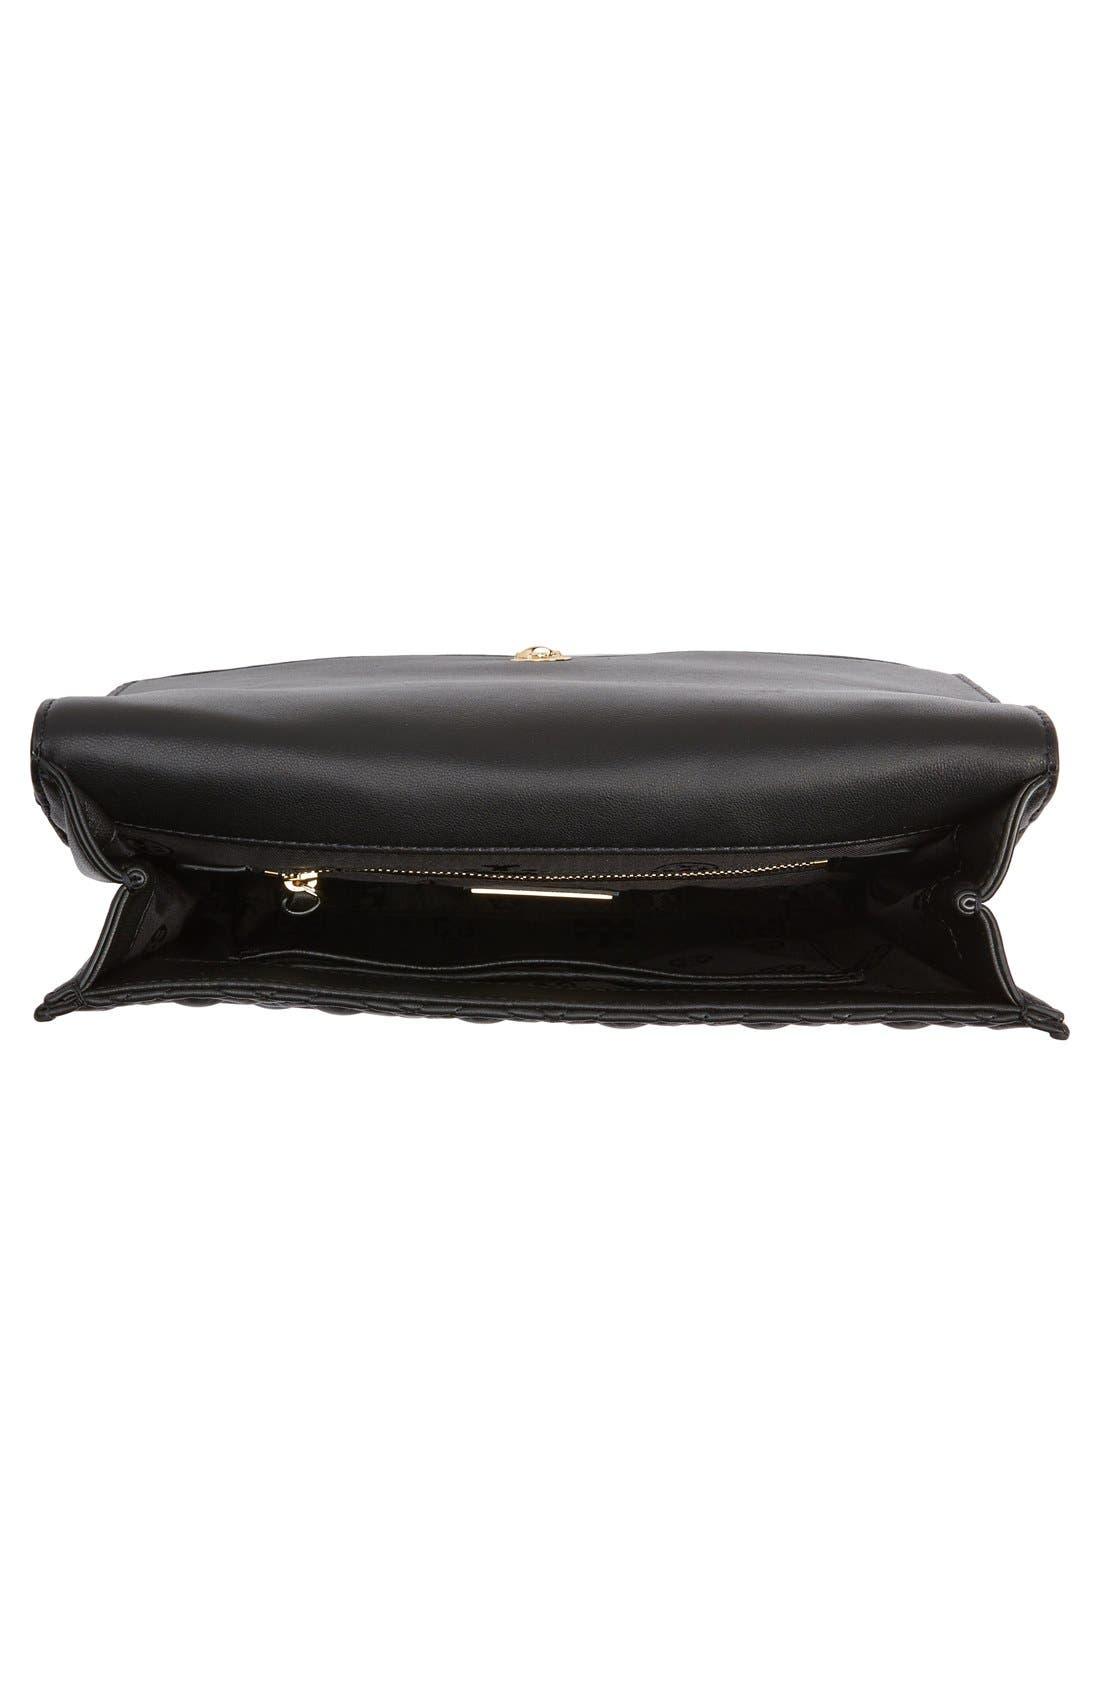 'Fleming' Convertible Shoulder Bag,                             Alternate thumbnail 4, color,                             BLACK